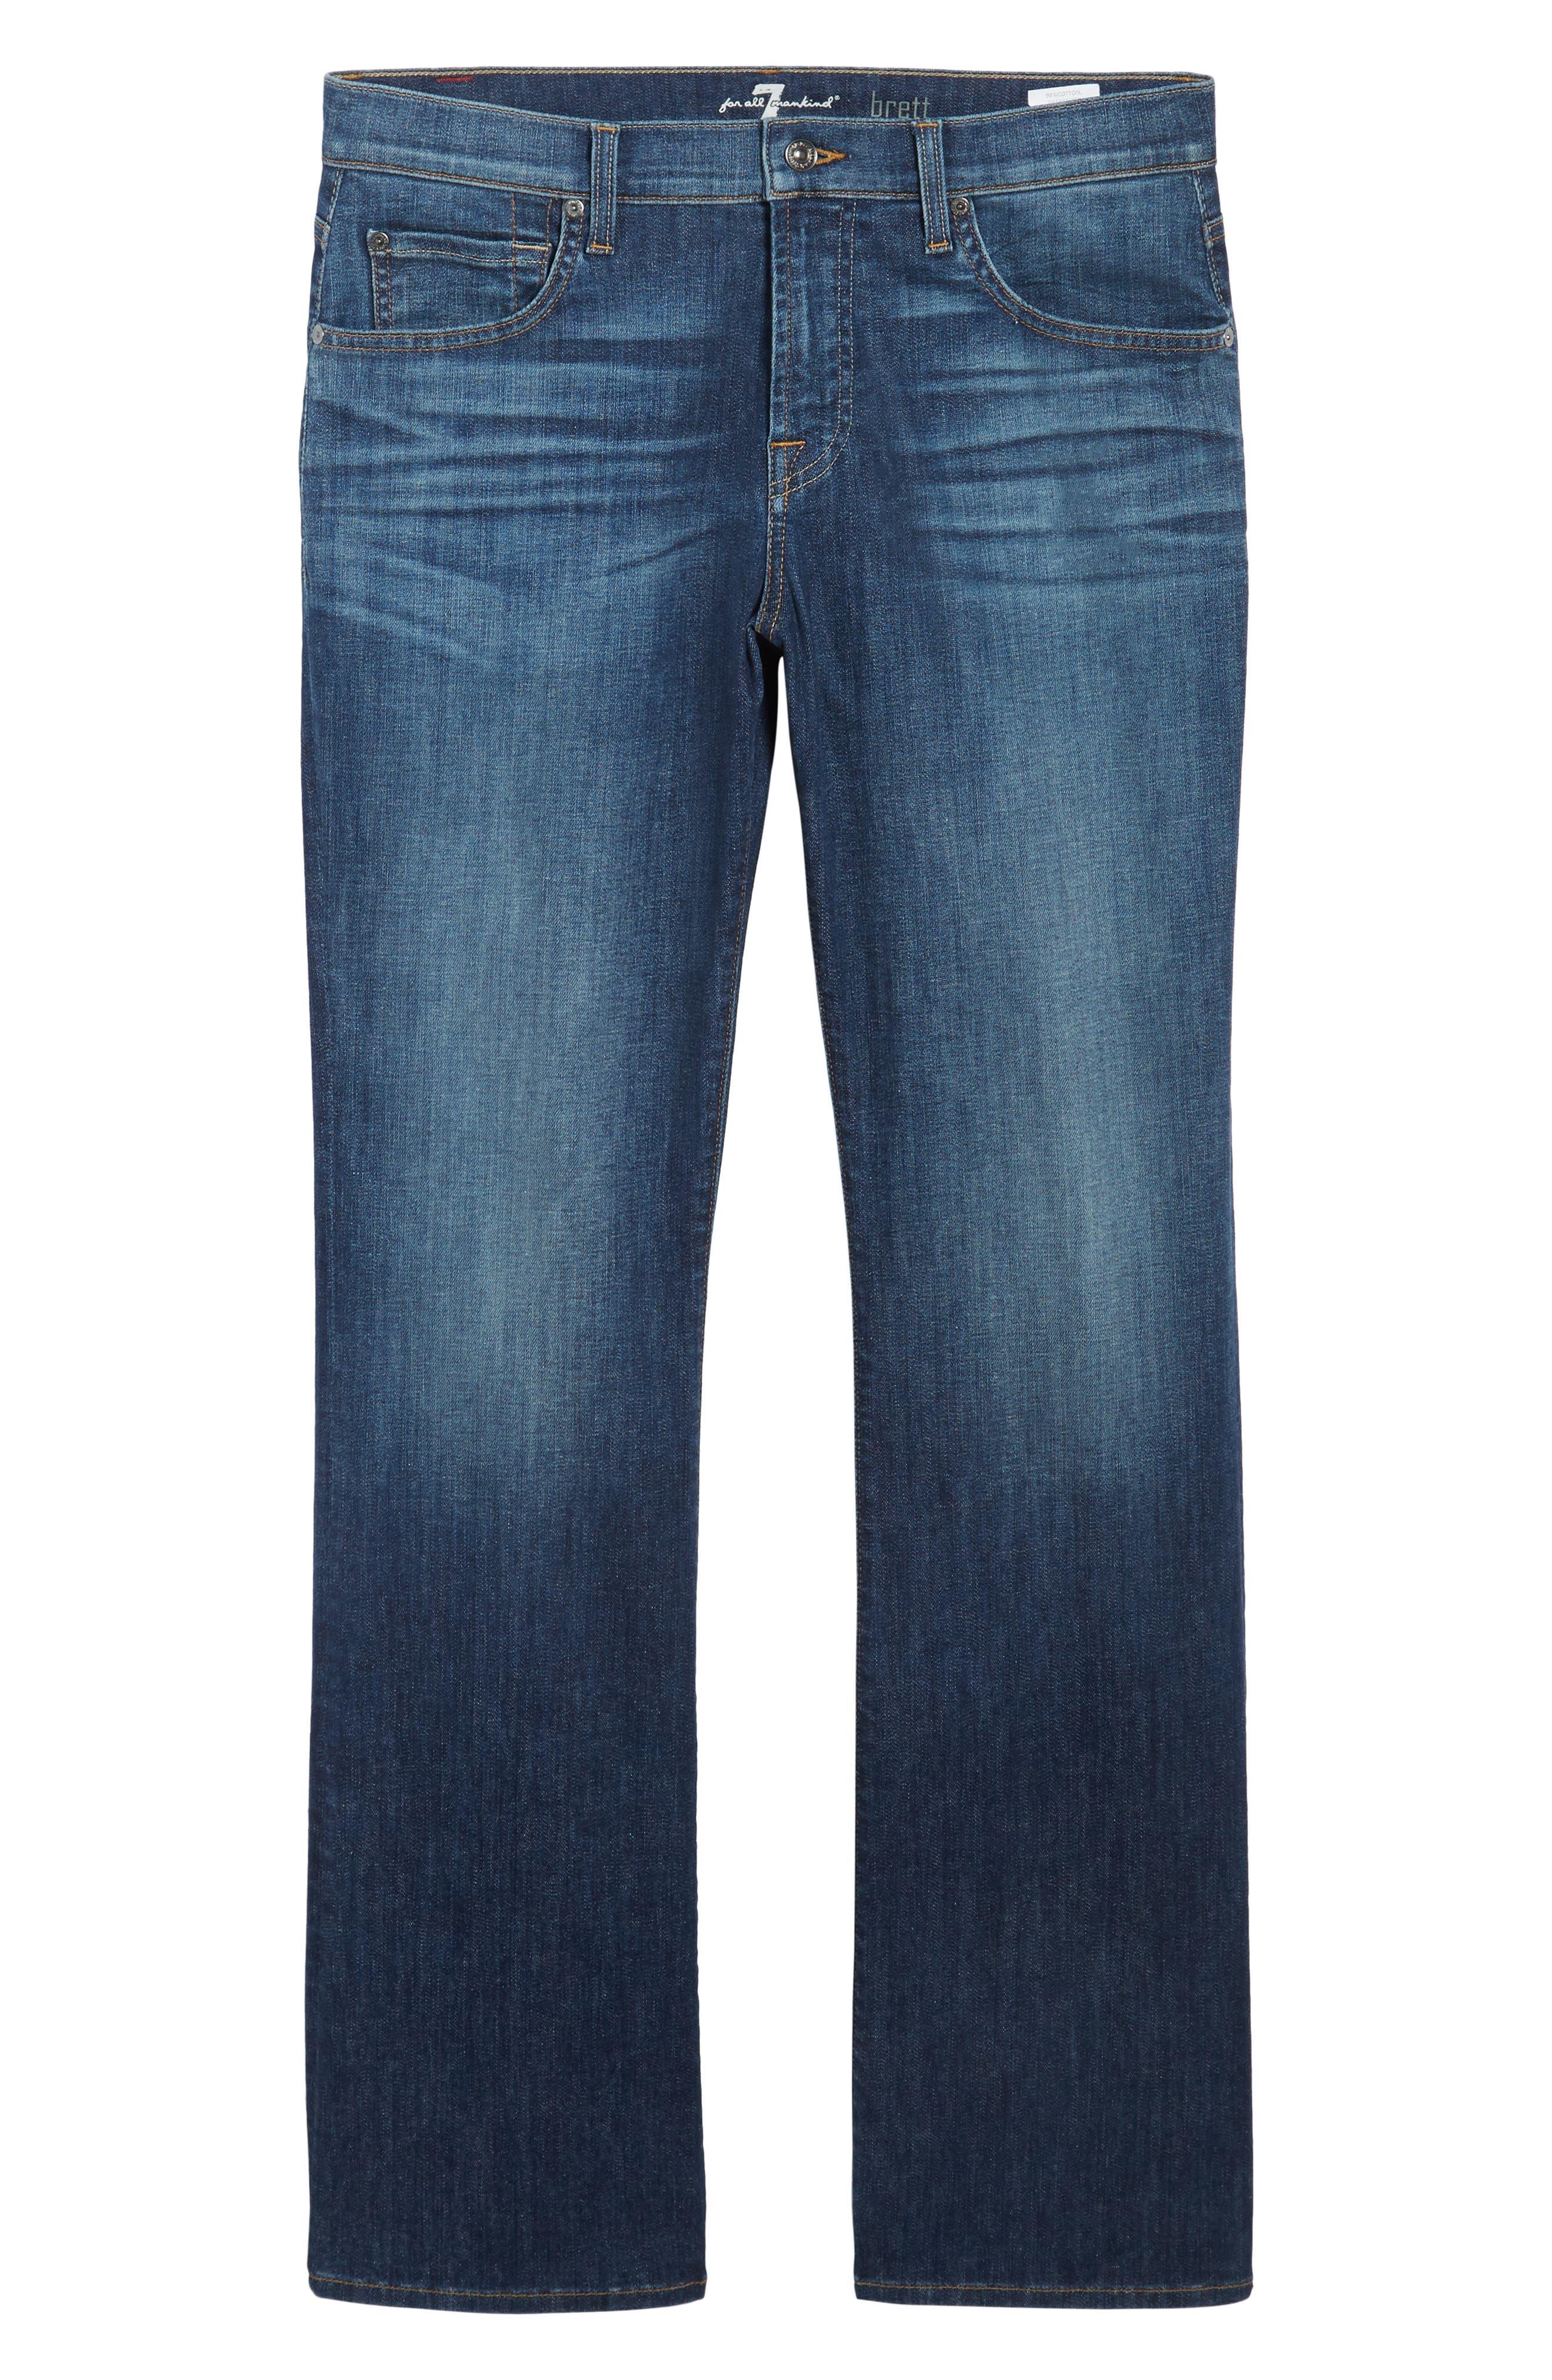 Brett Bootcut Jeans,                             Alternate thumbnail 6, color,                             400